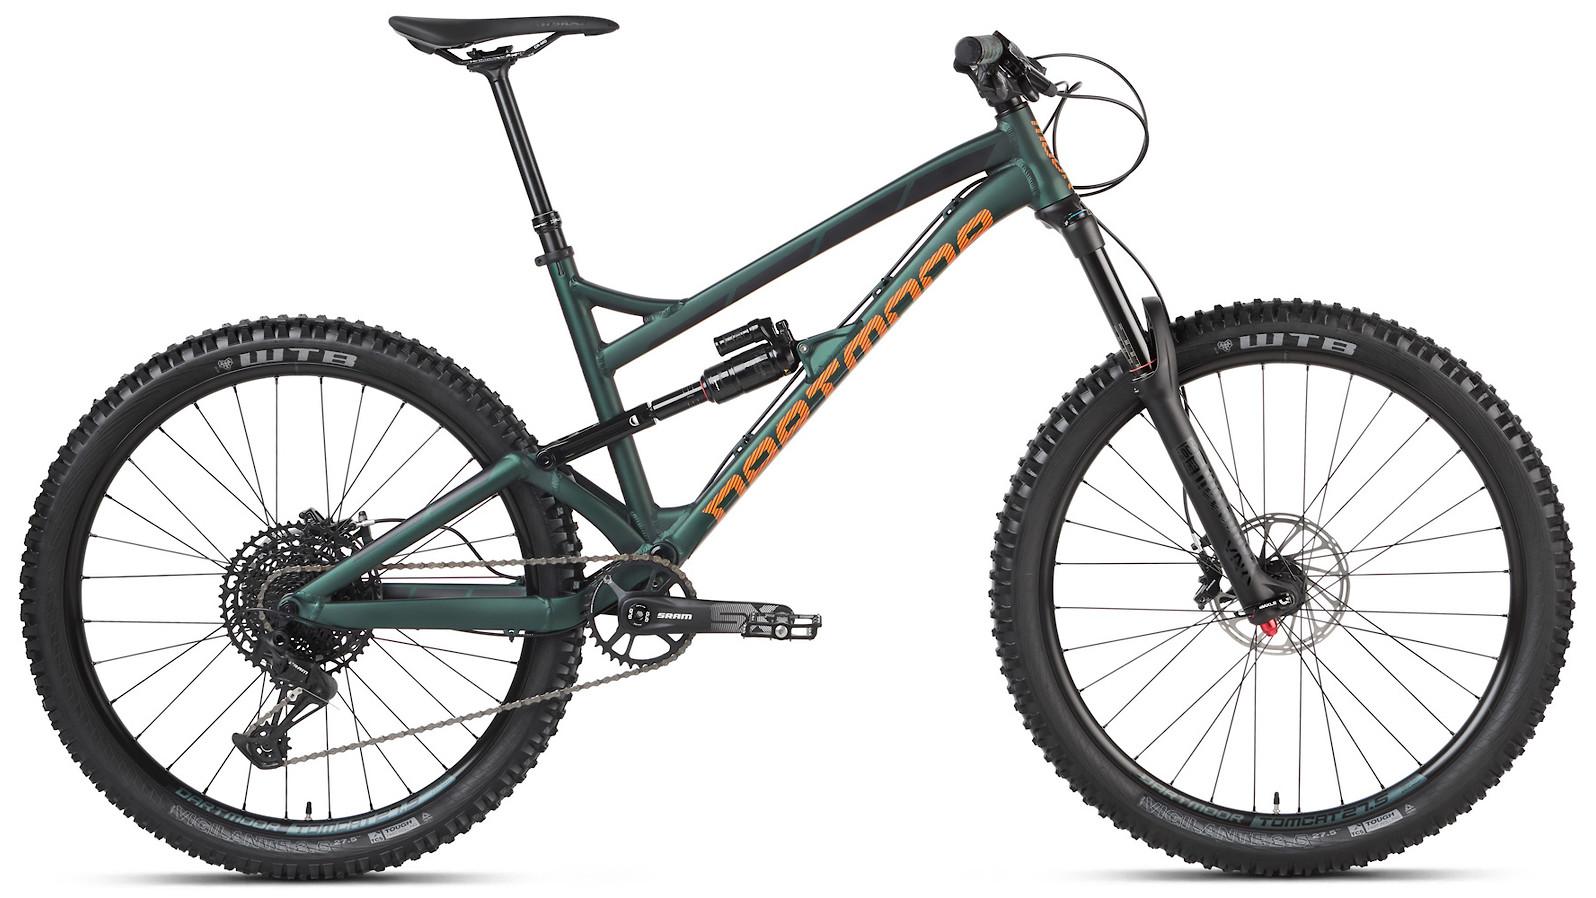 2020 Dartmoor Blackbird EVO 27.5